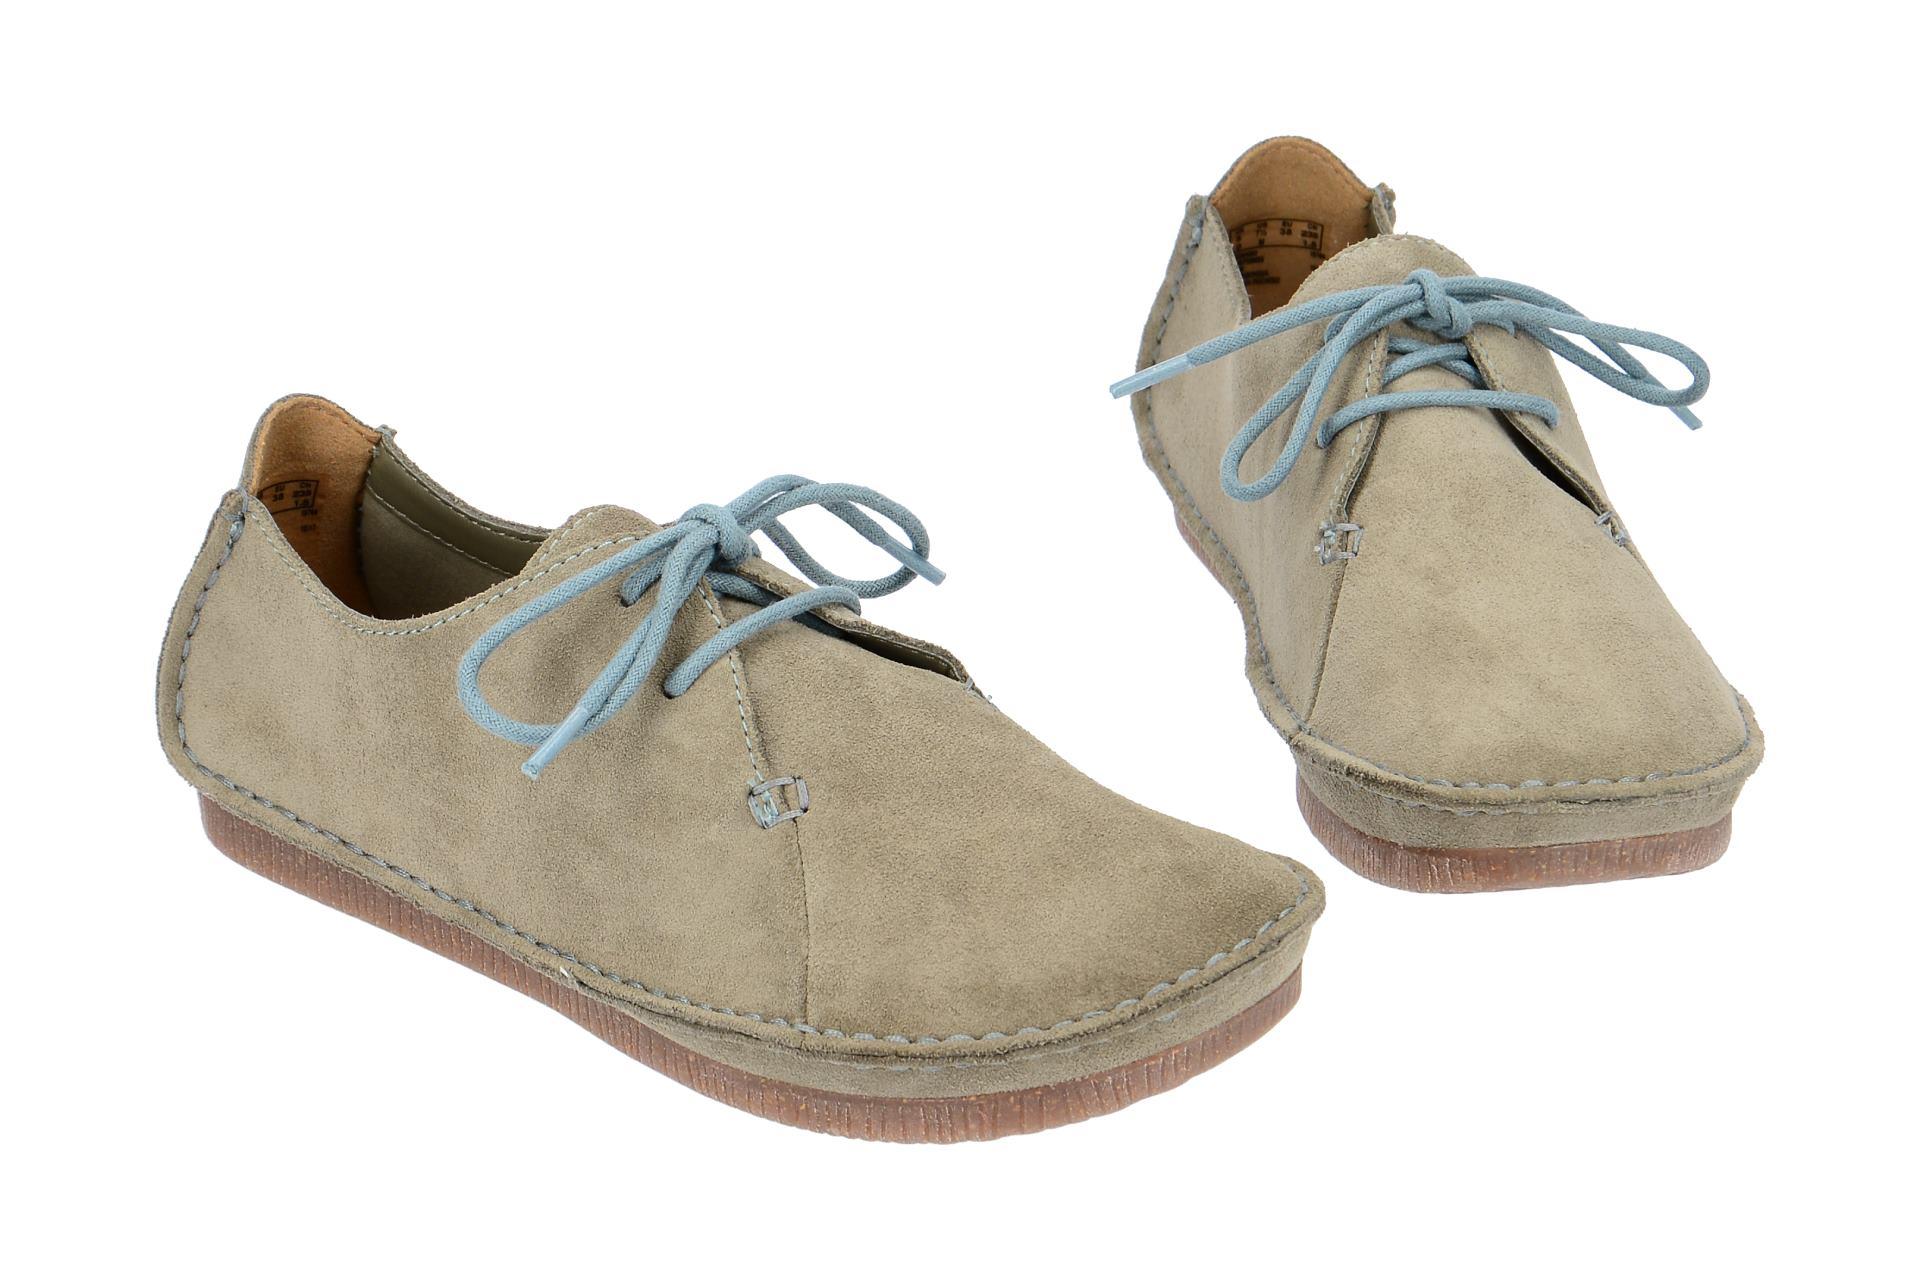 0d325f40396e Clarks Schuhe JANEY MAE grau Damenschuhe bequeme Schnür-Halbschuhe 26132339  4